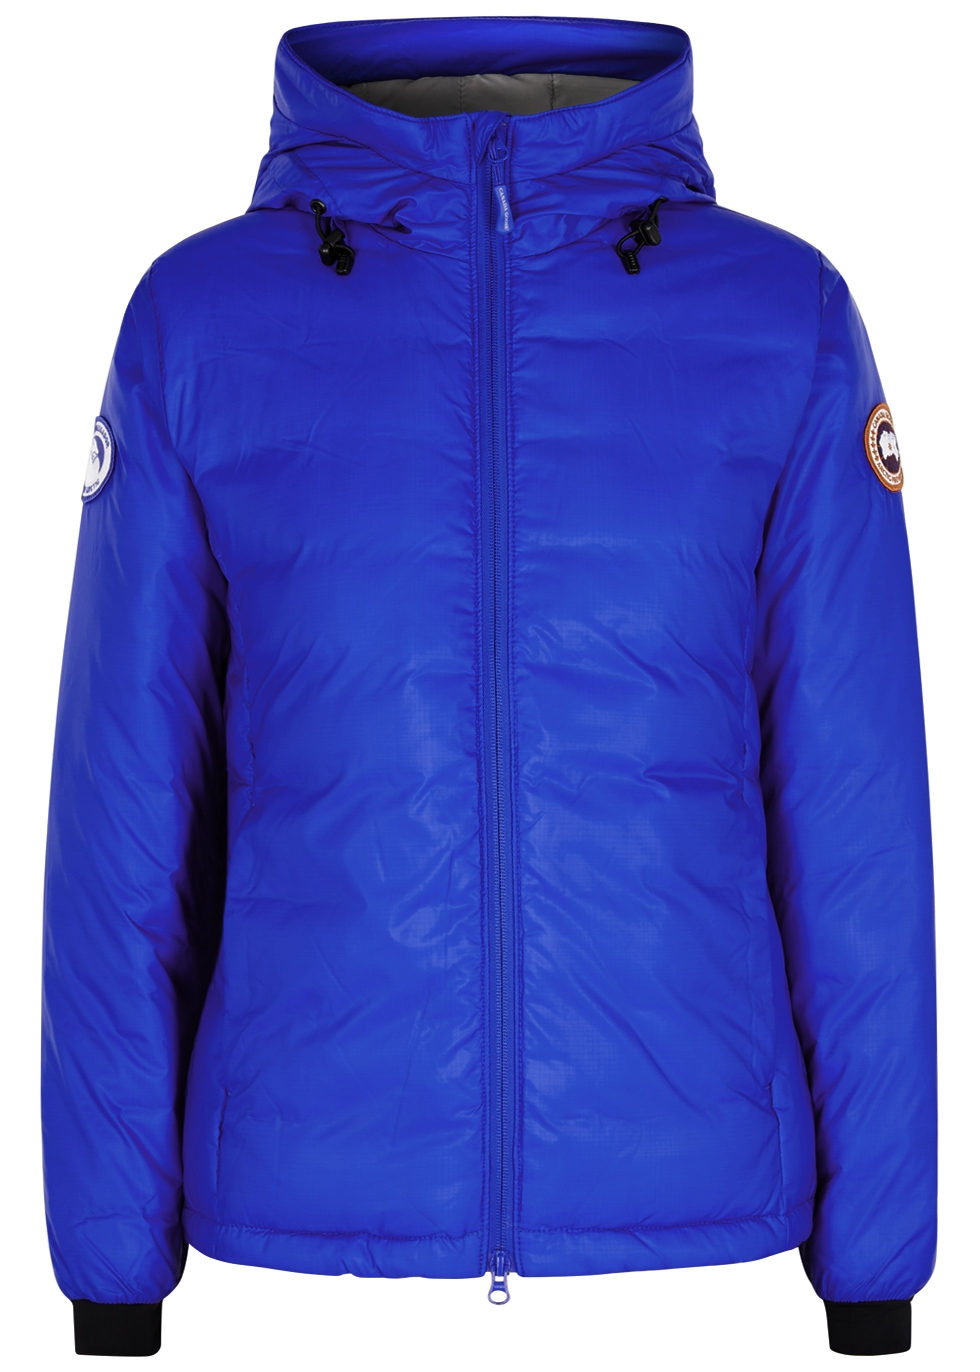 canada goose jacket harvey nichols